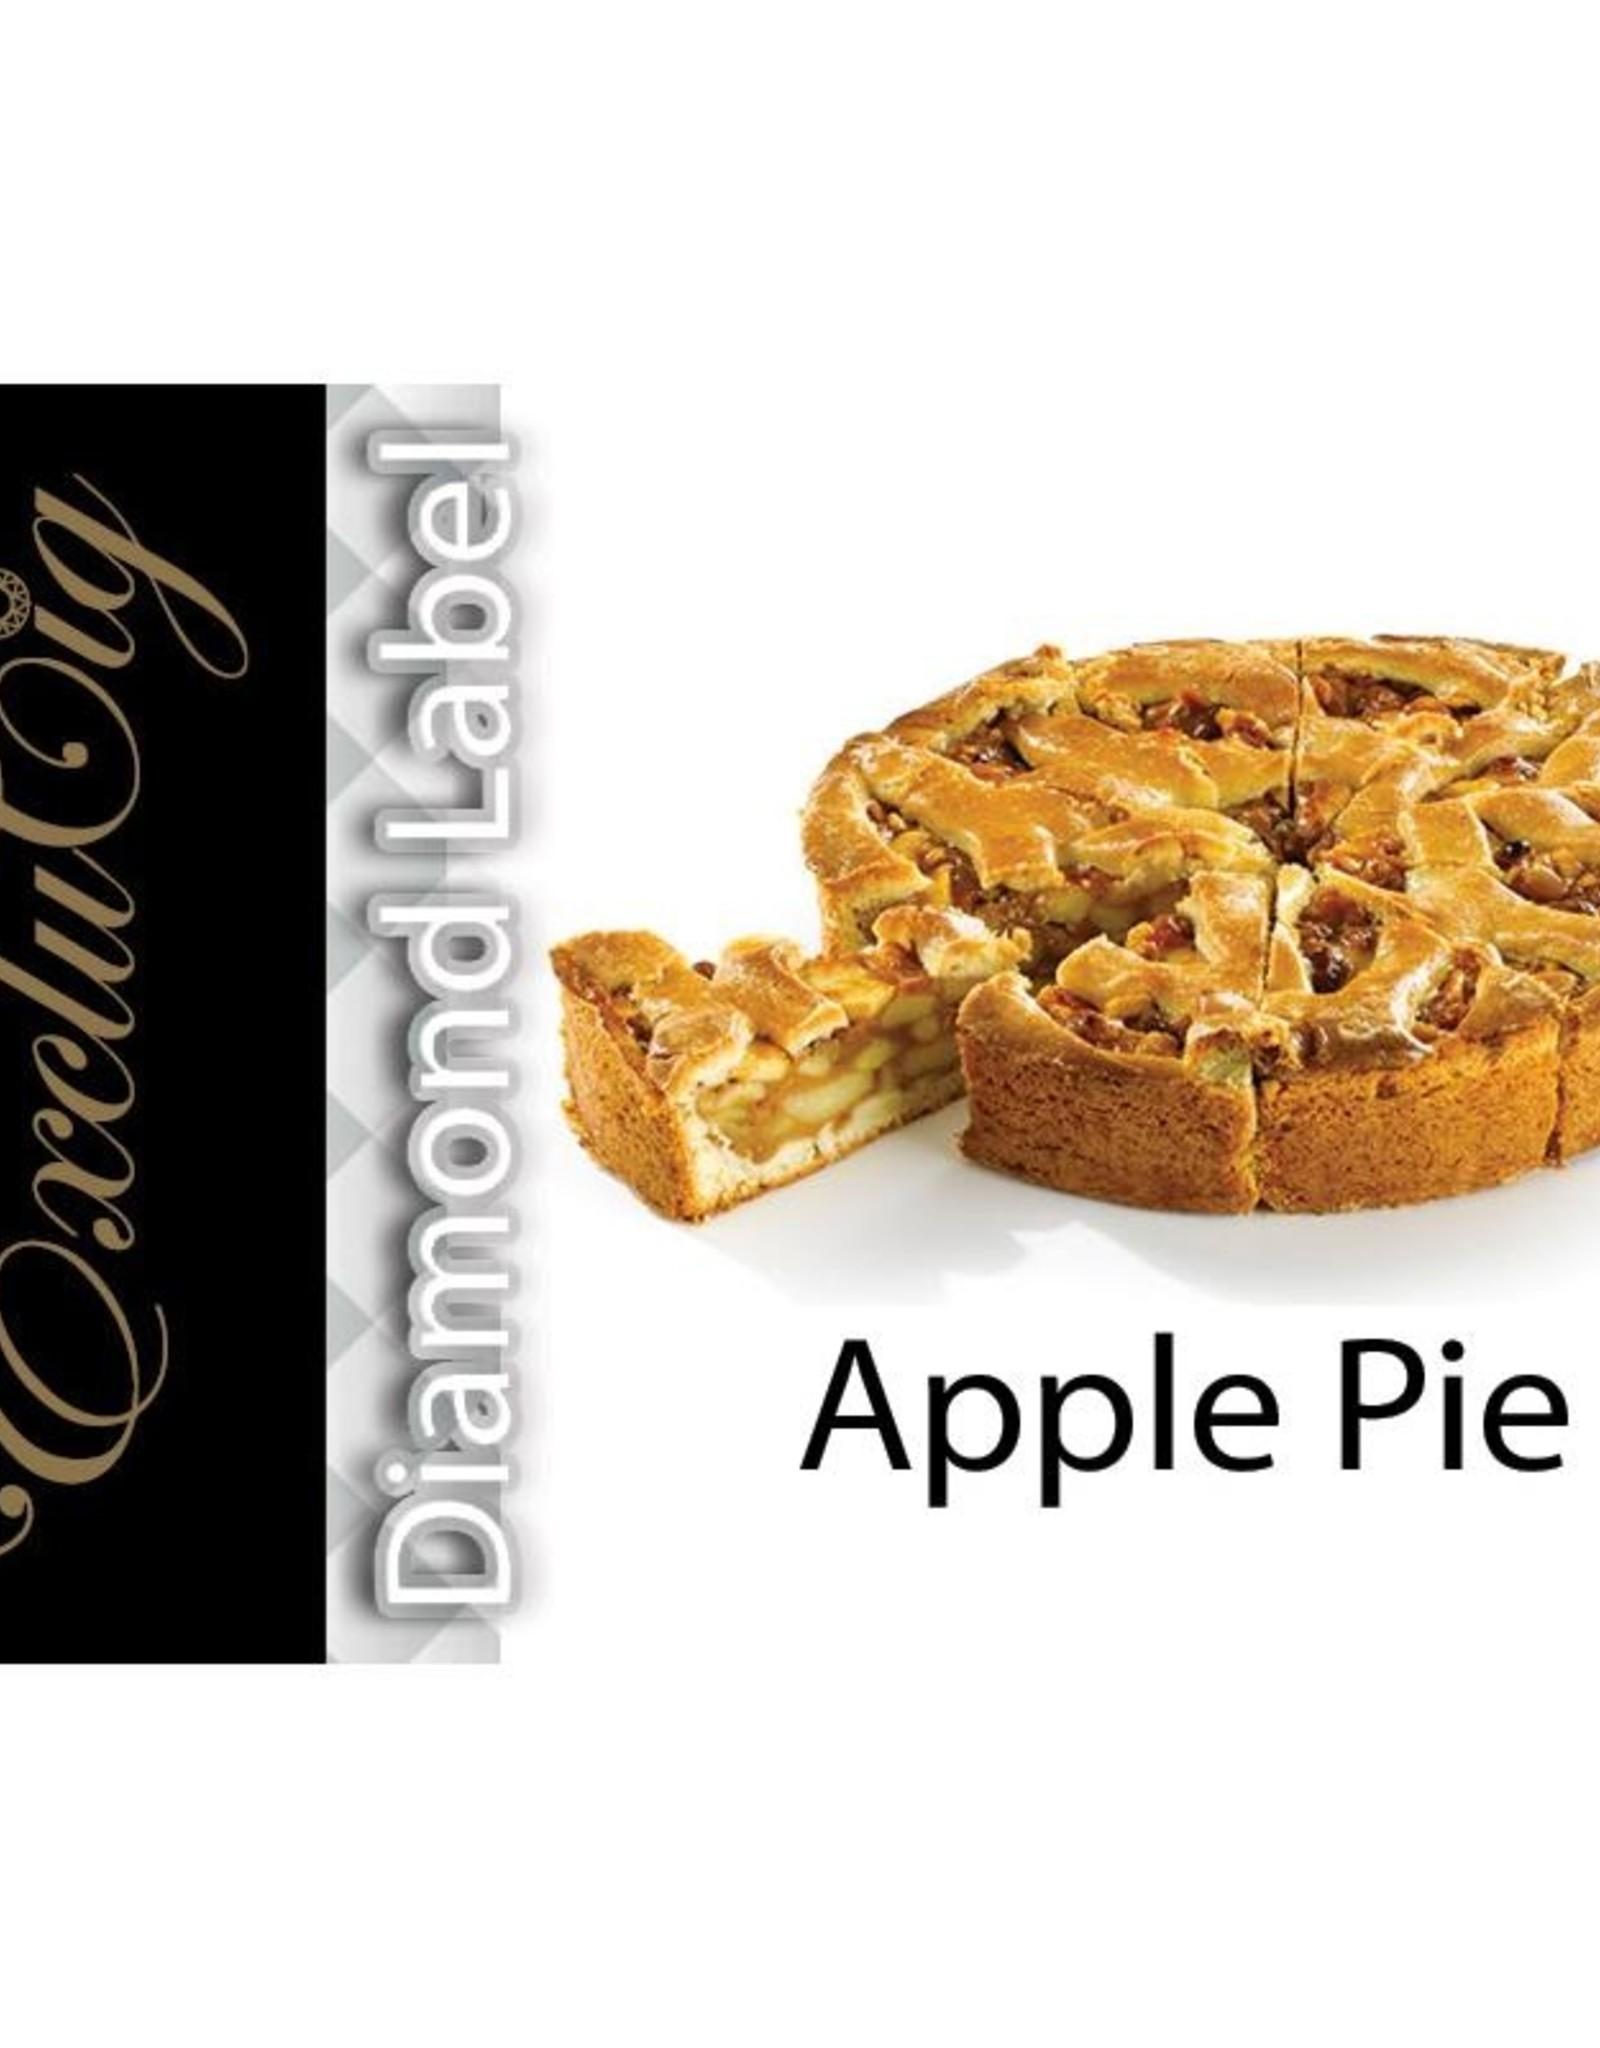 Exclucig Exclucig Diamond Label E-liquid Apple Pie 3 mg Nicotine